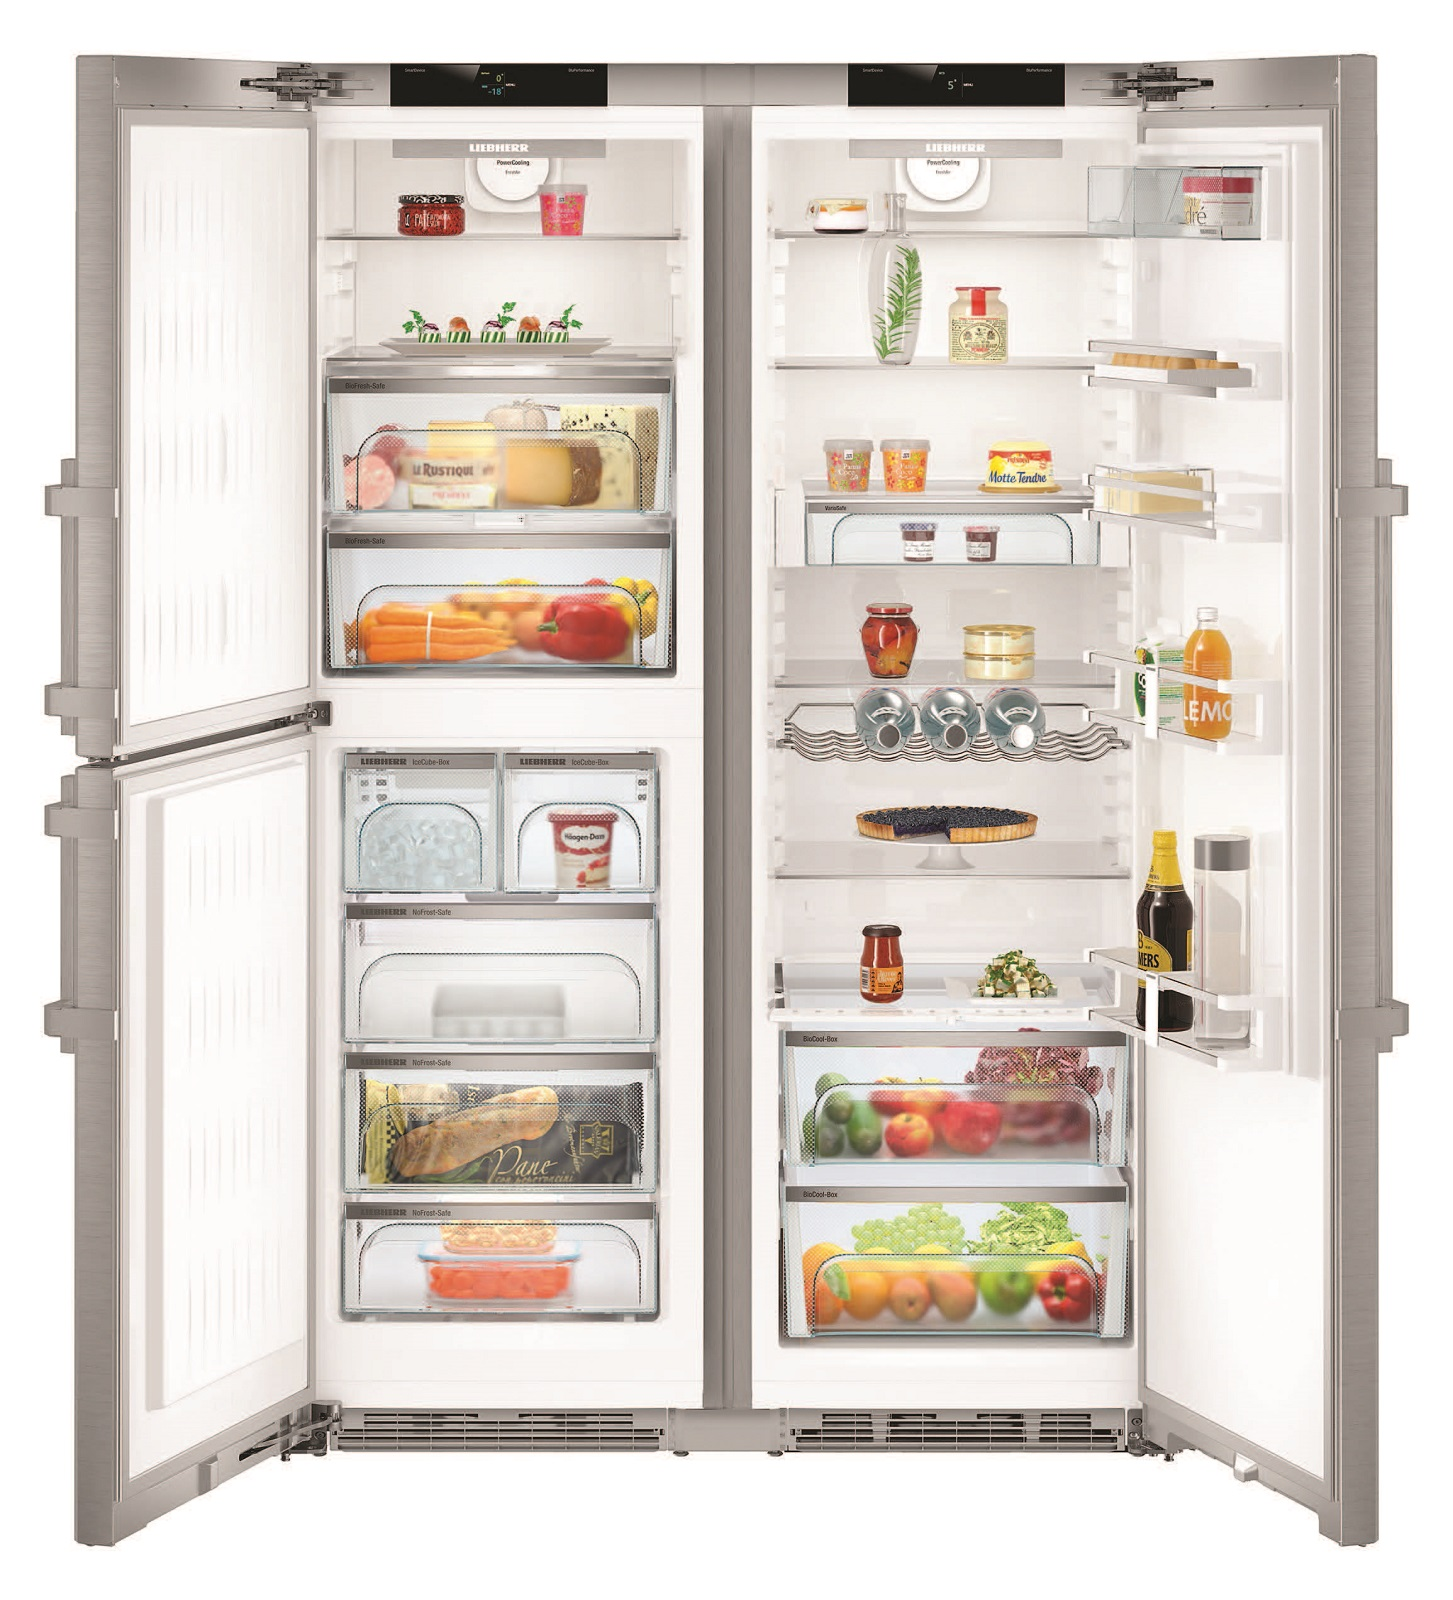 Side-by-Side холодильник Liebherr SBSes 8483 купить украина